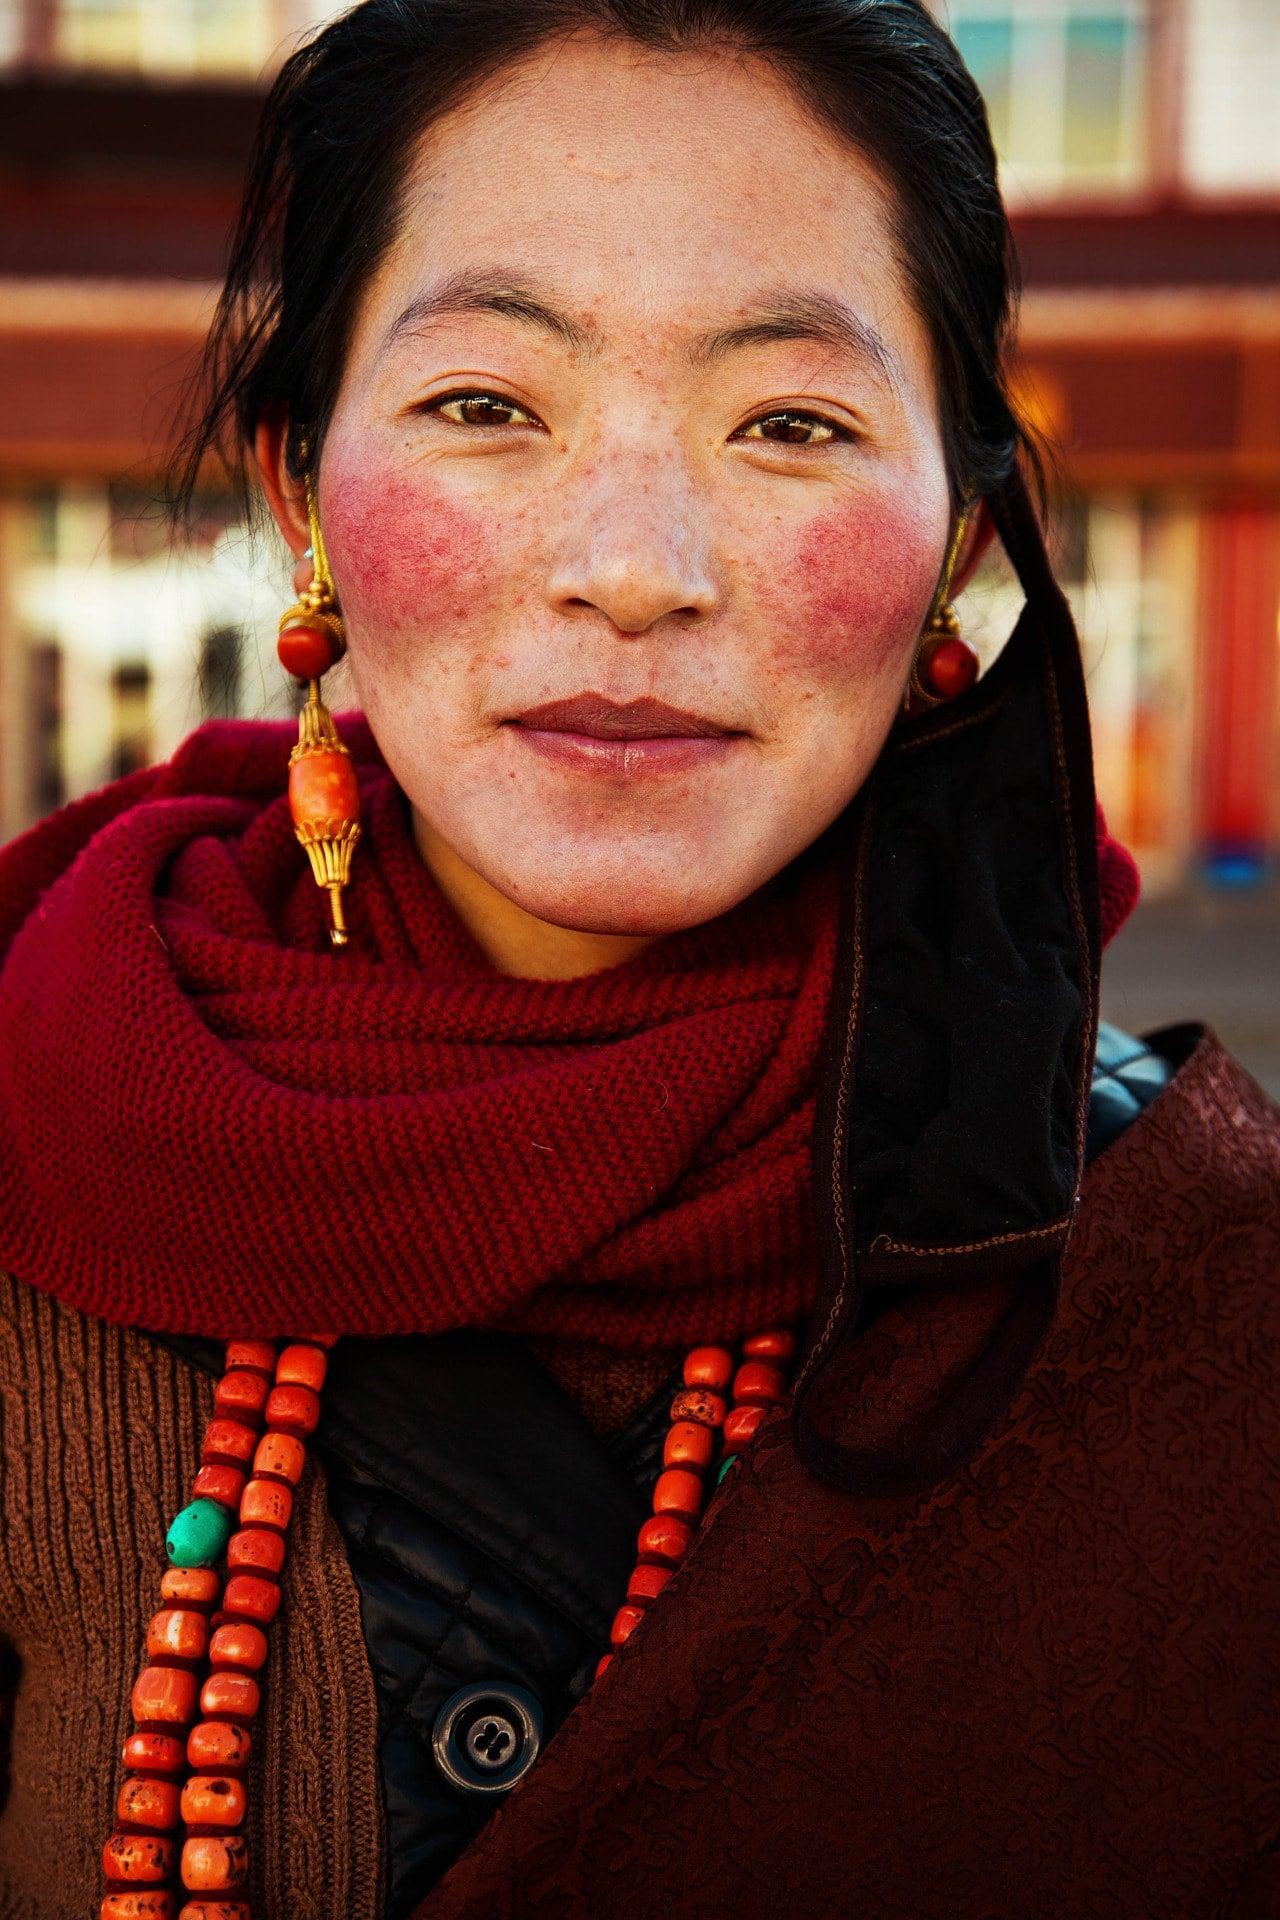 tibetan-woman-mihaela-noroc-min